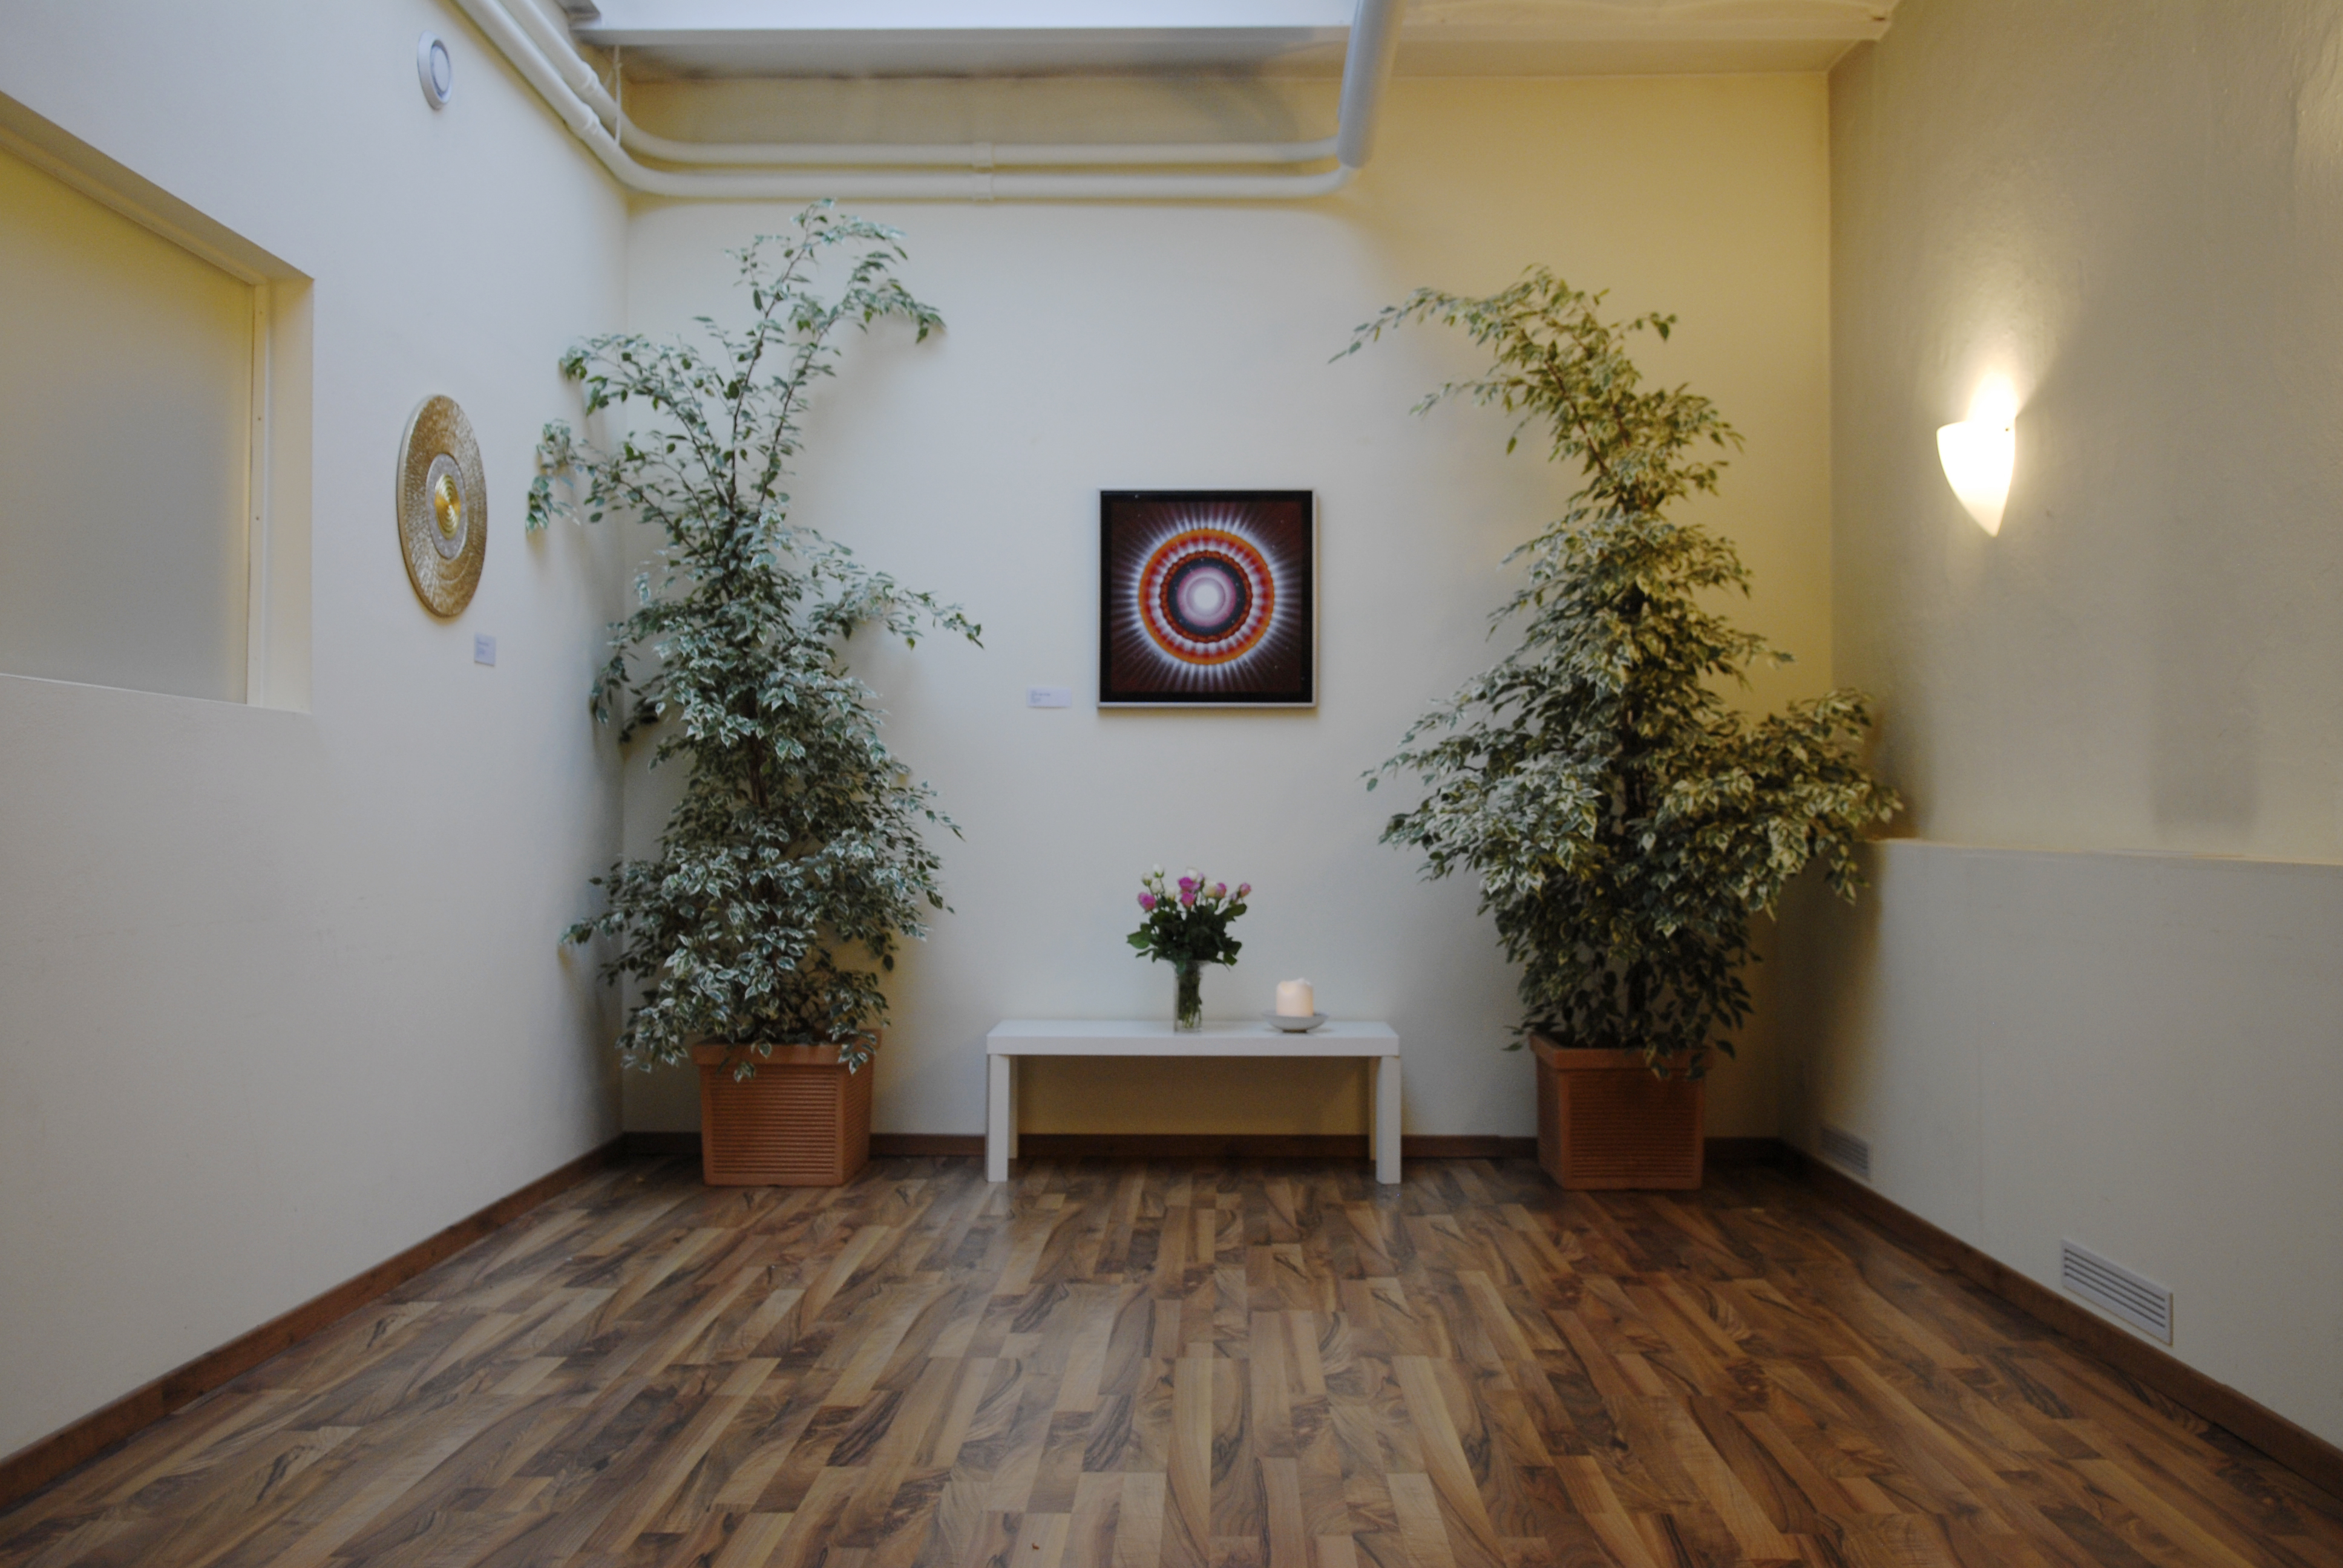 gruppenr ume zu vermieten raum mieten raumvermietung partyraum. Black Bedroom Furniture Sets. Home Design Ideas